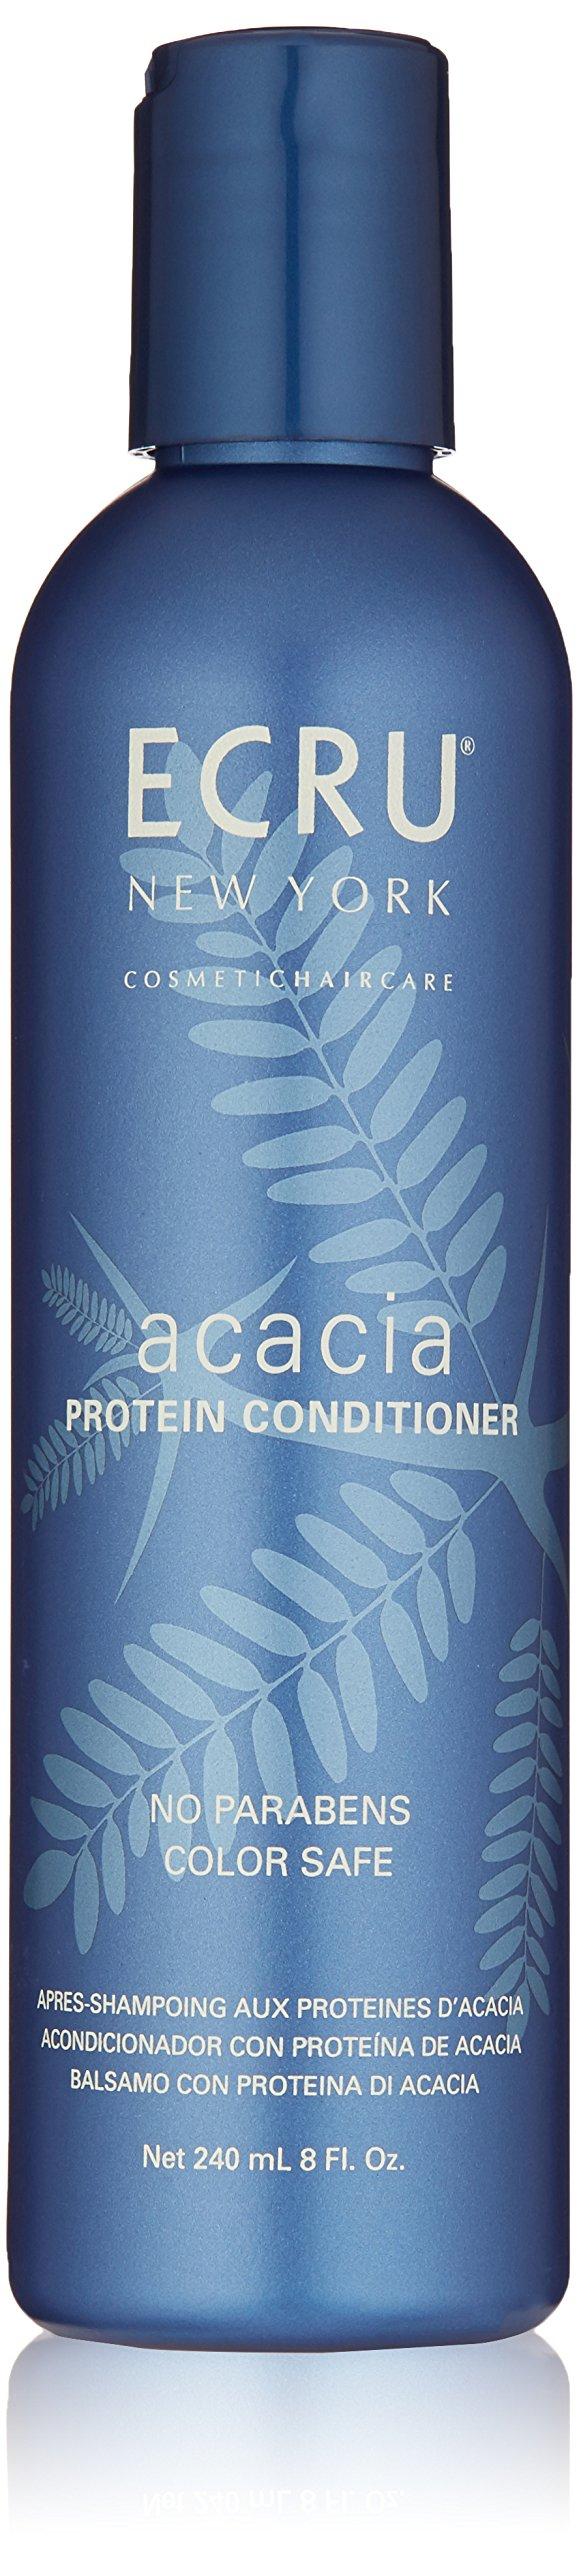 Ecru New York Acacia Protein Conditioner, 8oz.